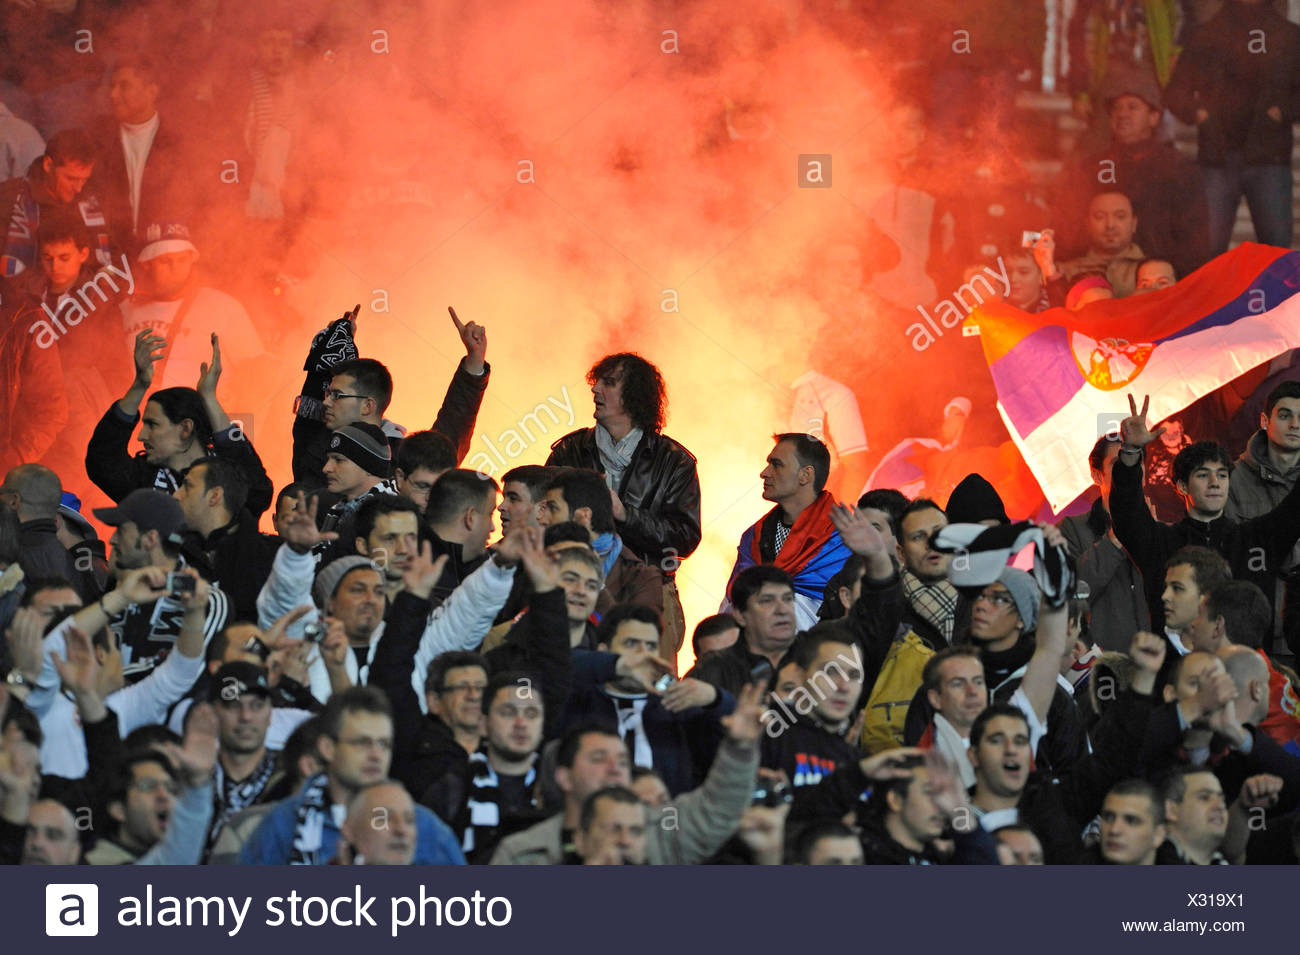 Hooligans lighting a bengali fire in the fanblock, Mercedes-Benz Arena, Stuttgart, Baden-Wuerttemberg, Germany, Europe - Stock Image